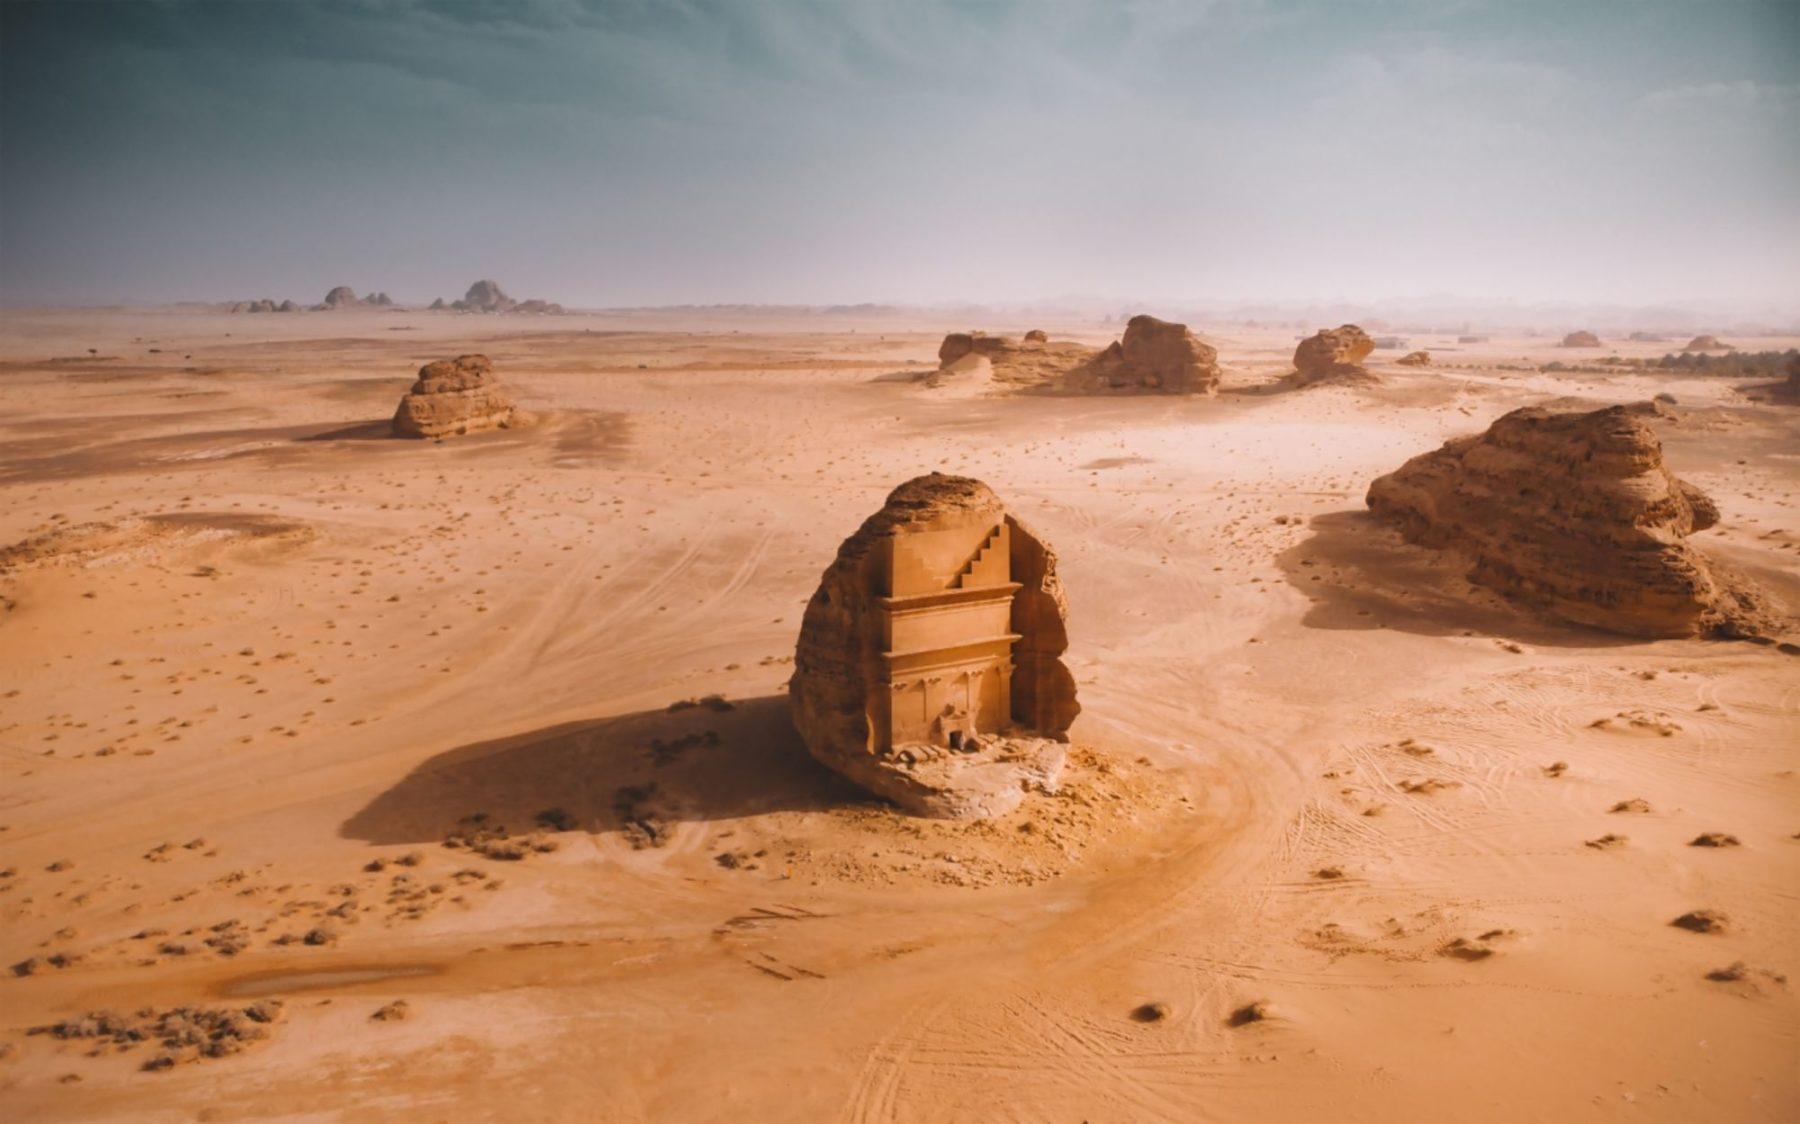 al-Hijr, Saudi Arabia